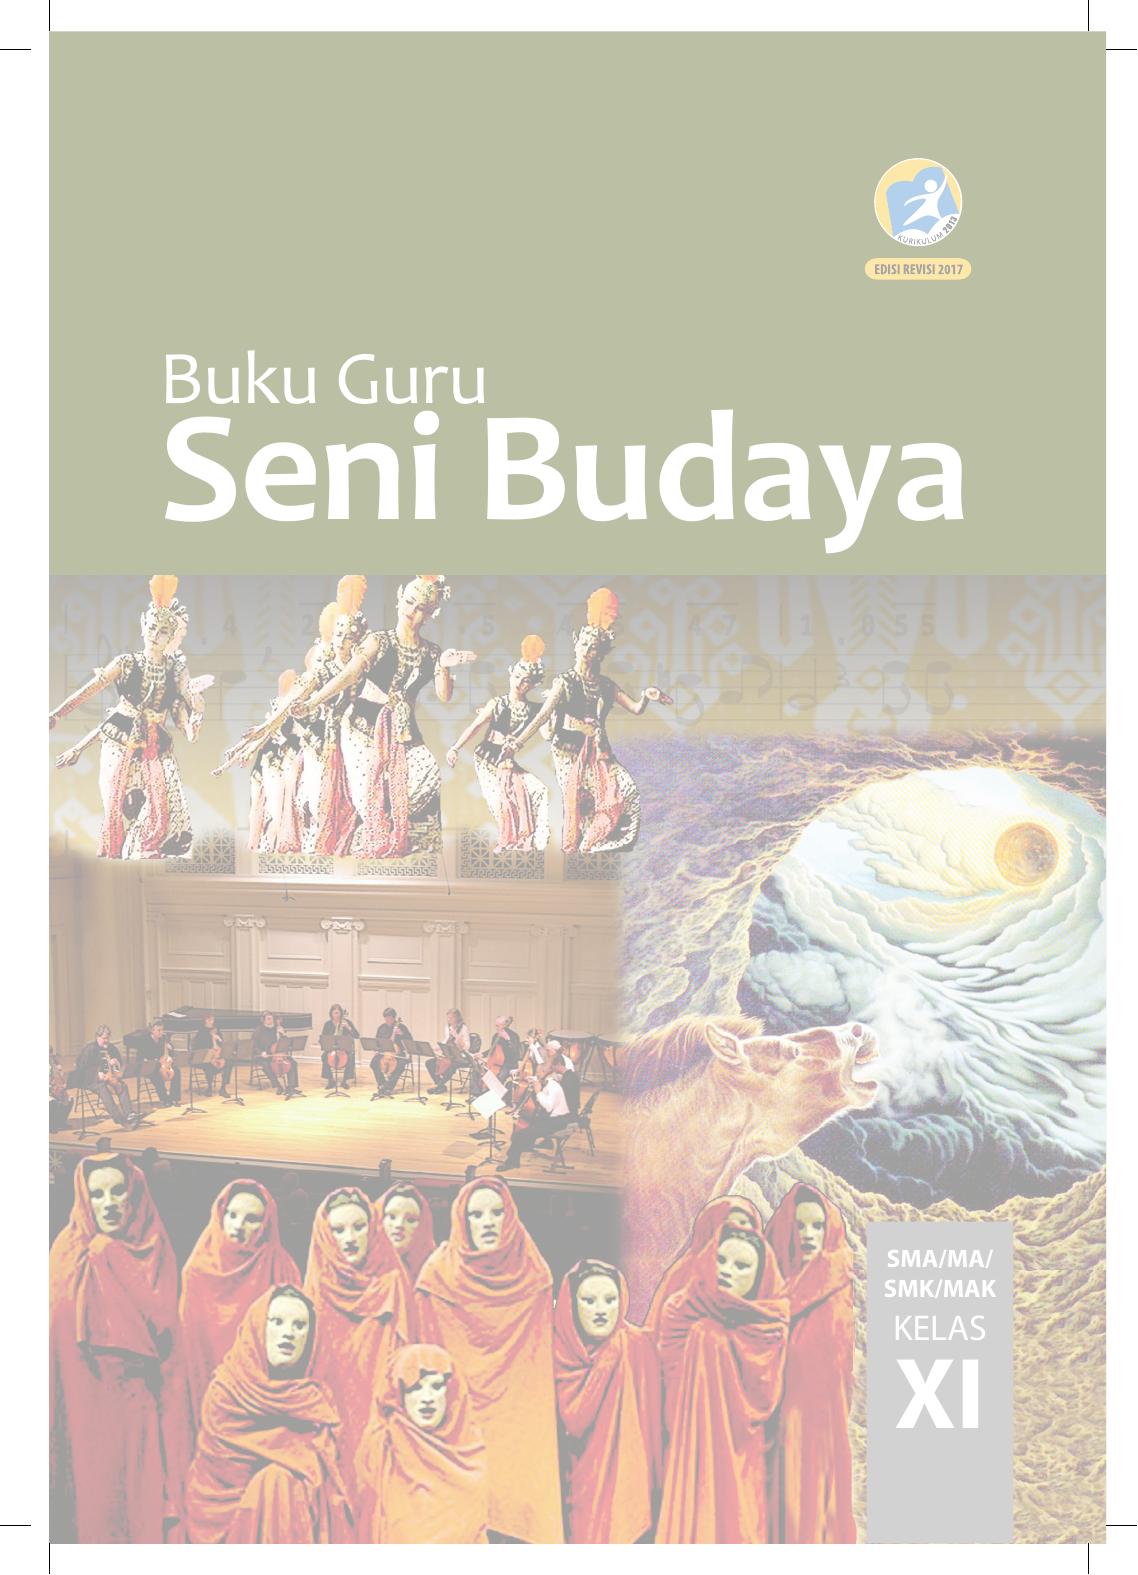 Buku Guru E Learning SMA Negeri 1 Cianjur